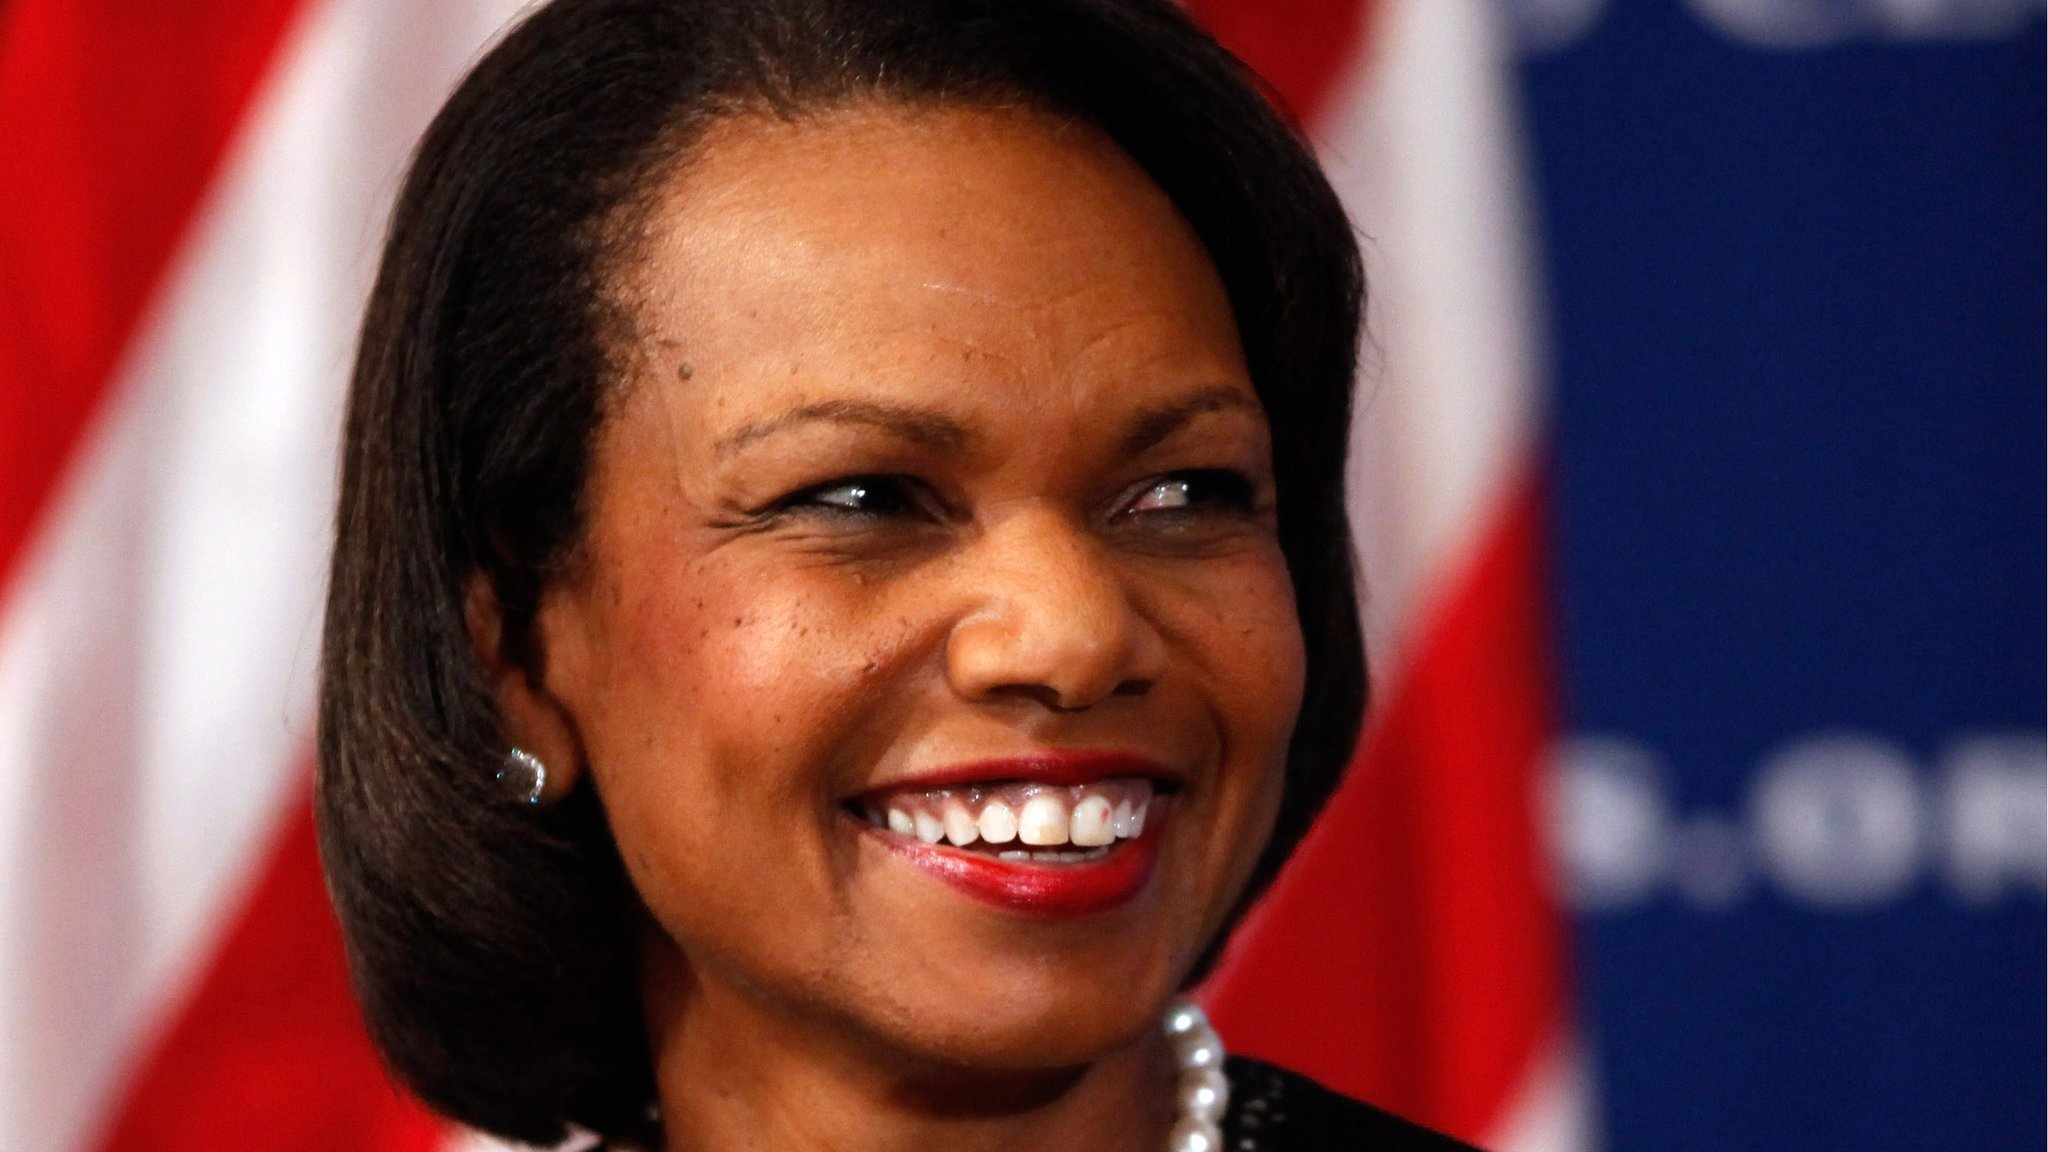 Cleveland Browns & Condoleezza Rice play down talk of head coach role